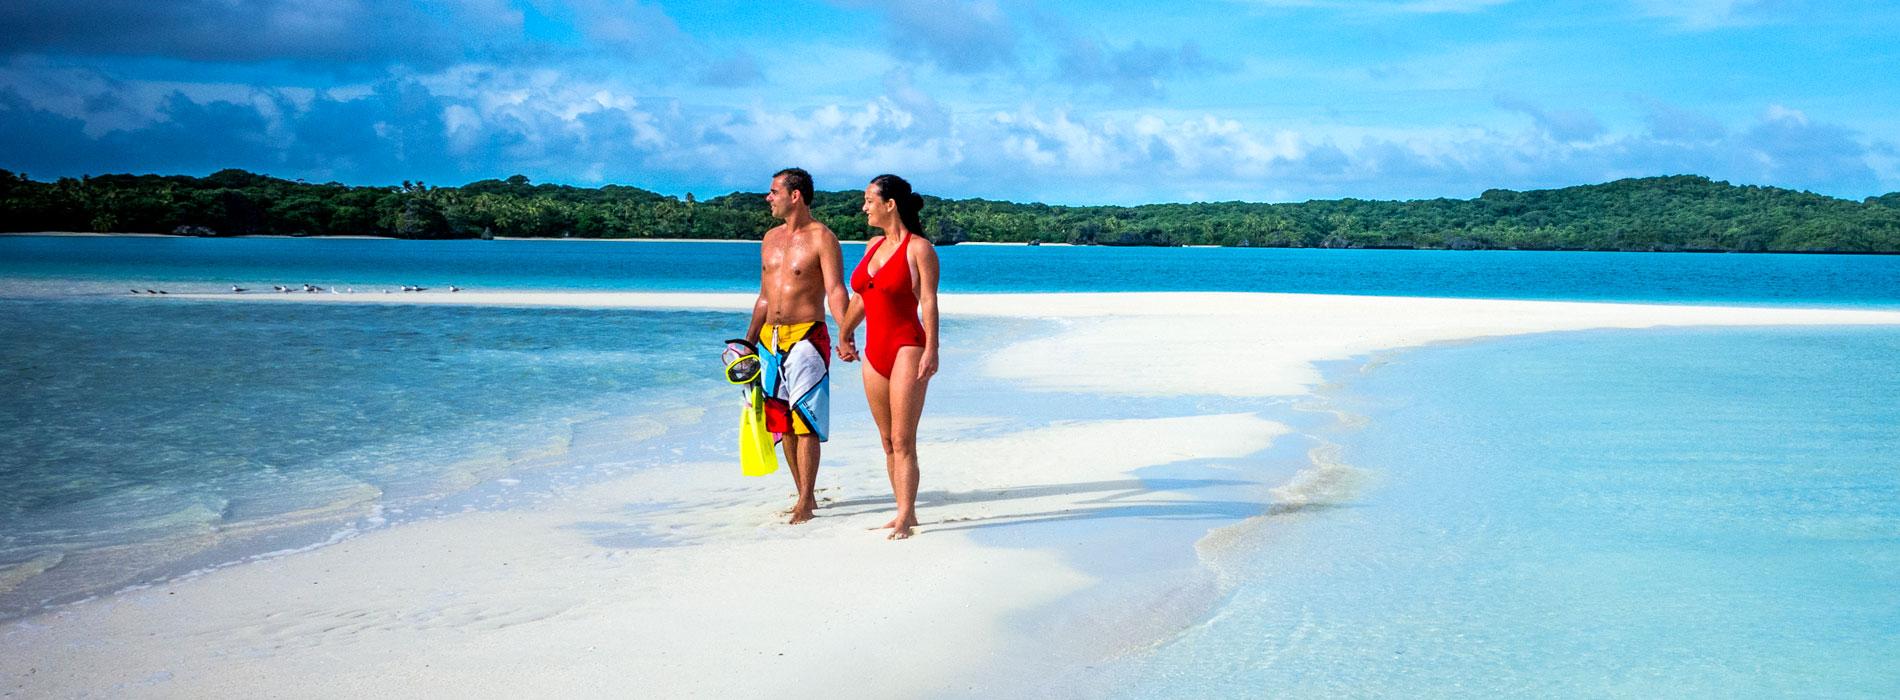 fiji resort cruise holiday